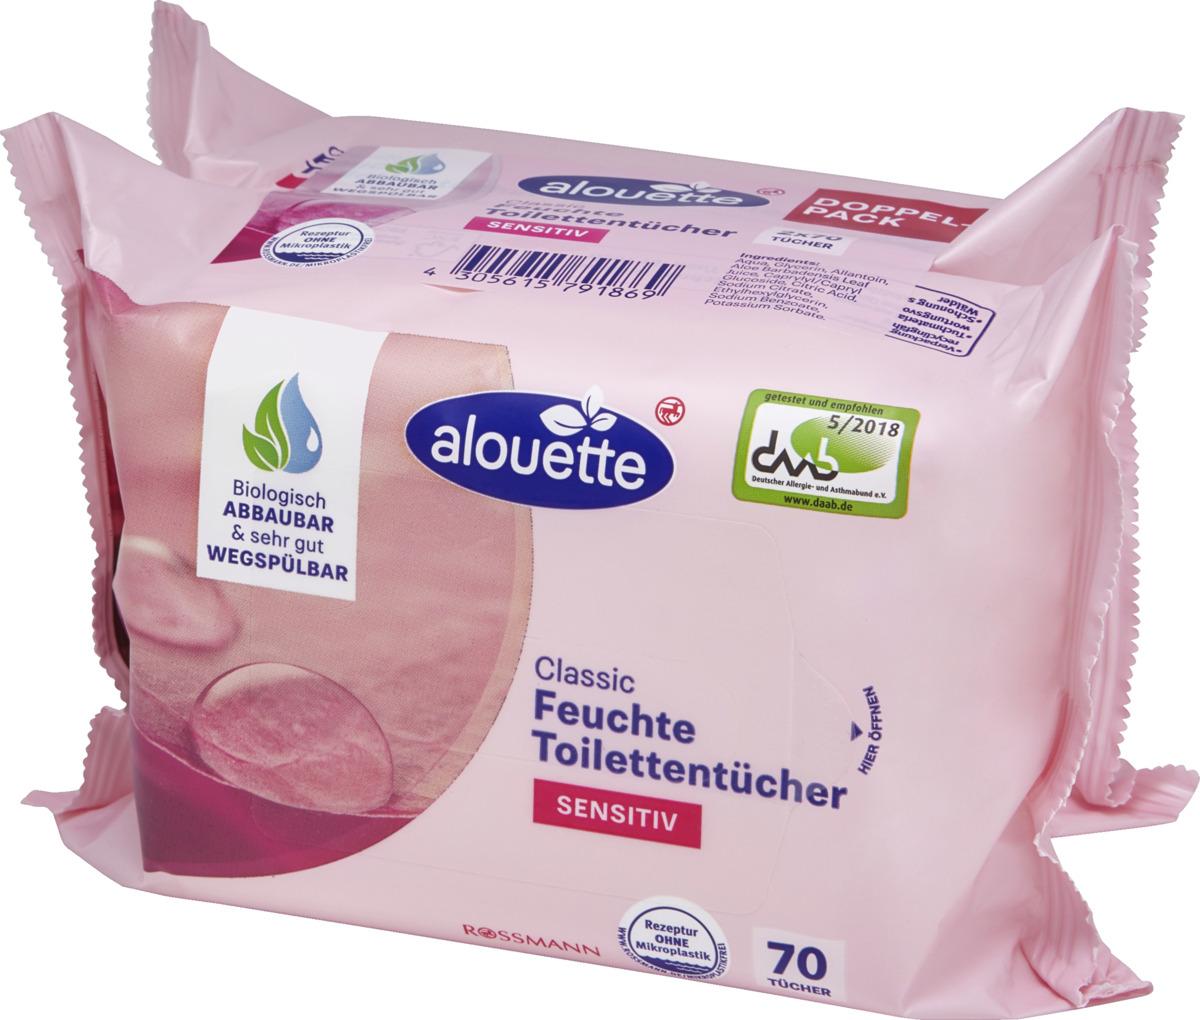 Bild 3 von alouette Classic feuchte Toilettentücher Sensitiv Doppelpack